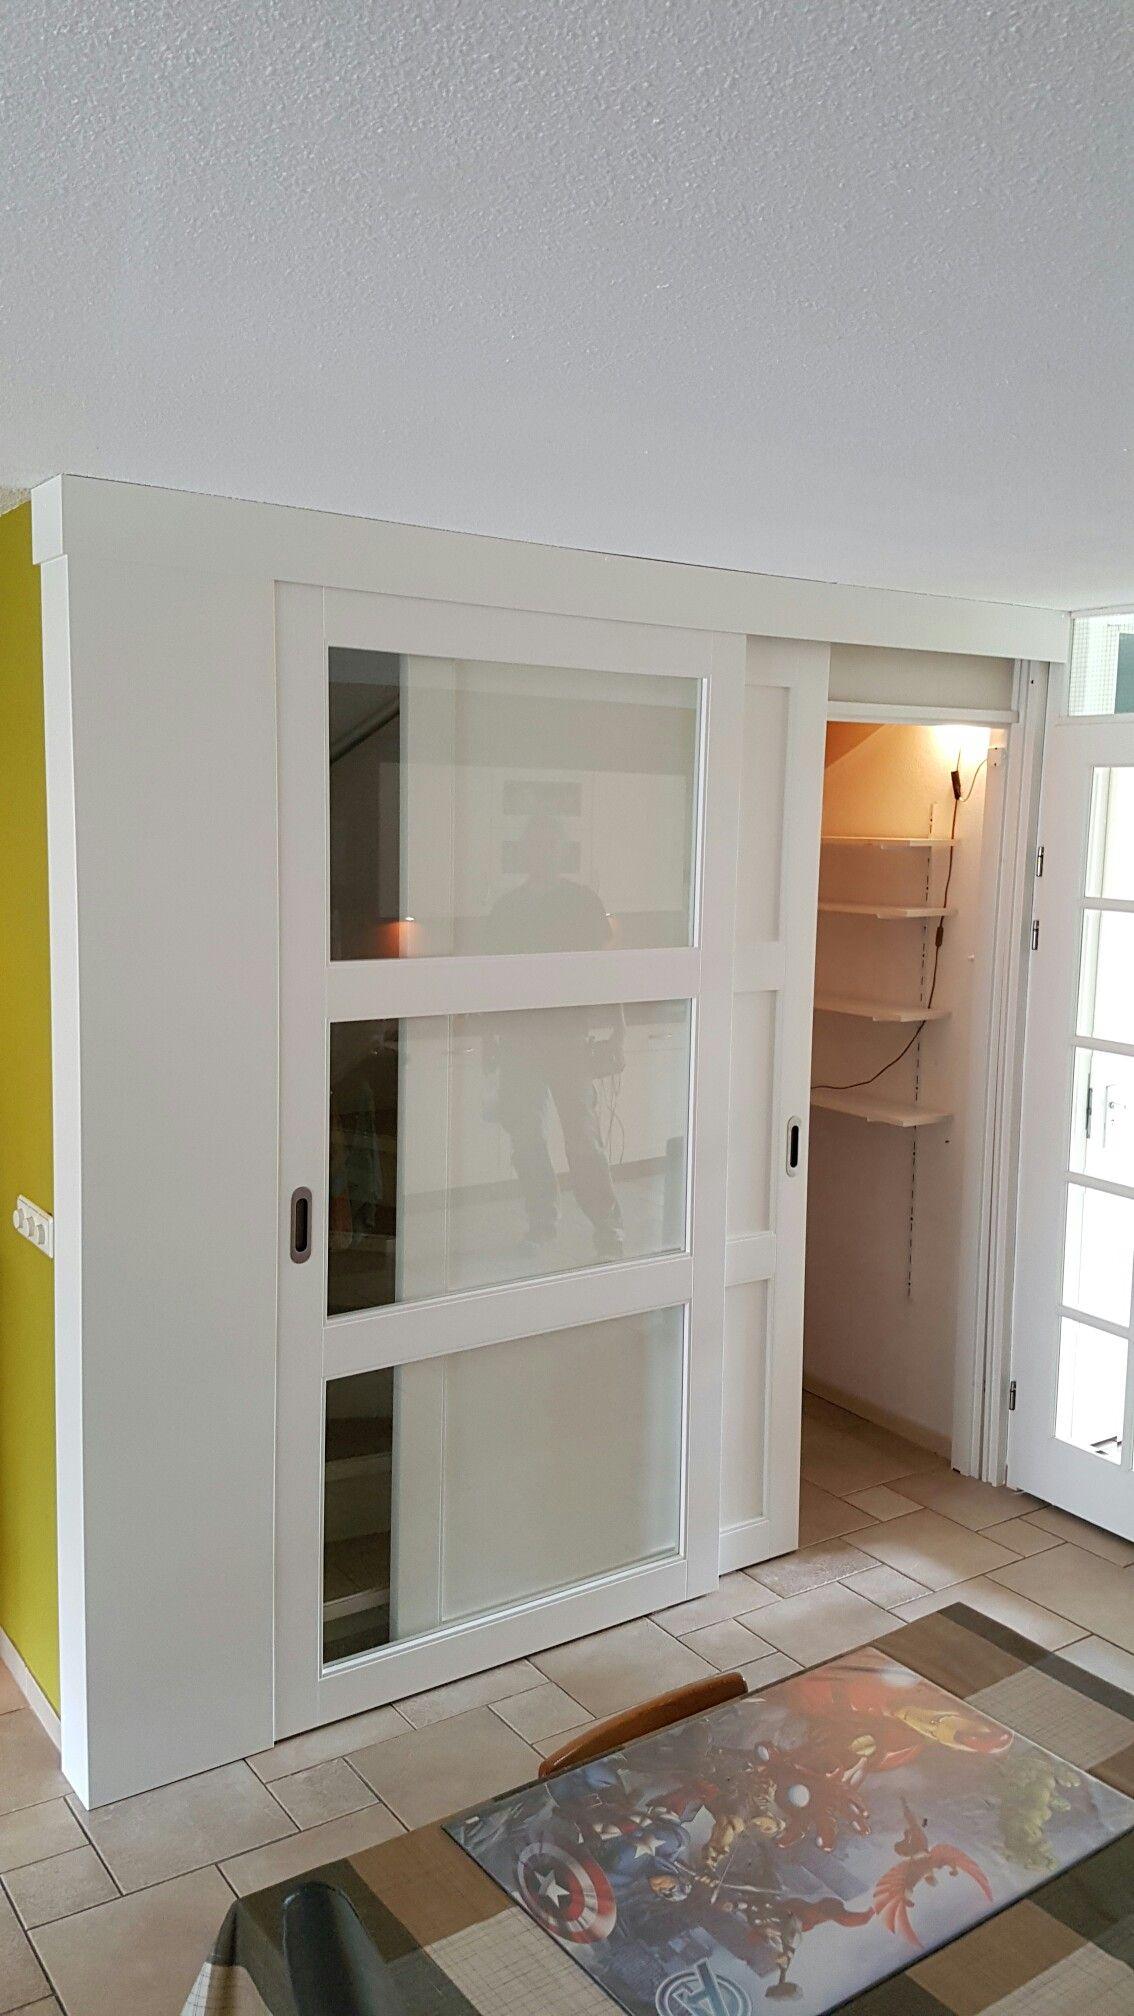 Schuifdeur voor trapkast | Moodboard woonkamer | Pinterest - Trap ...